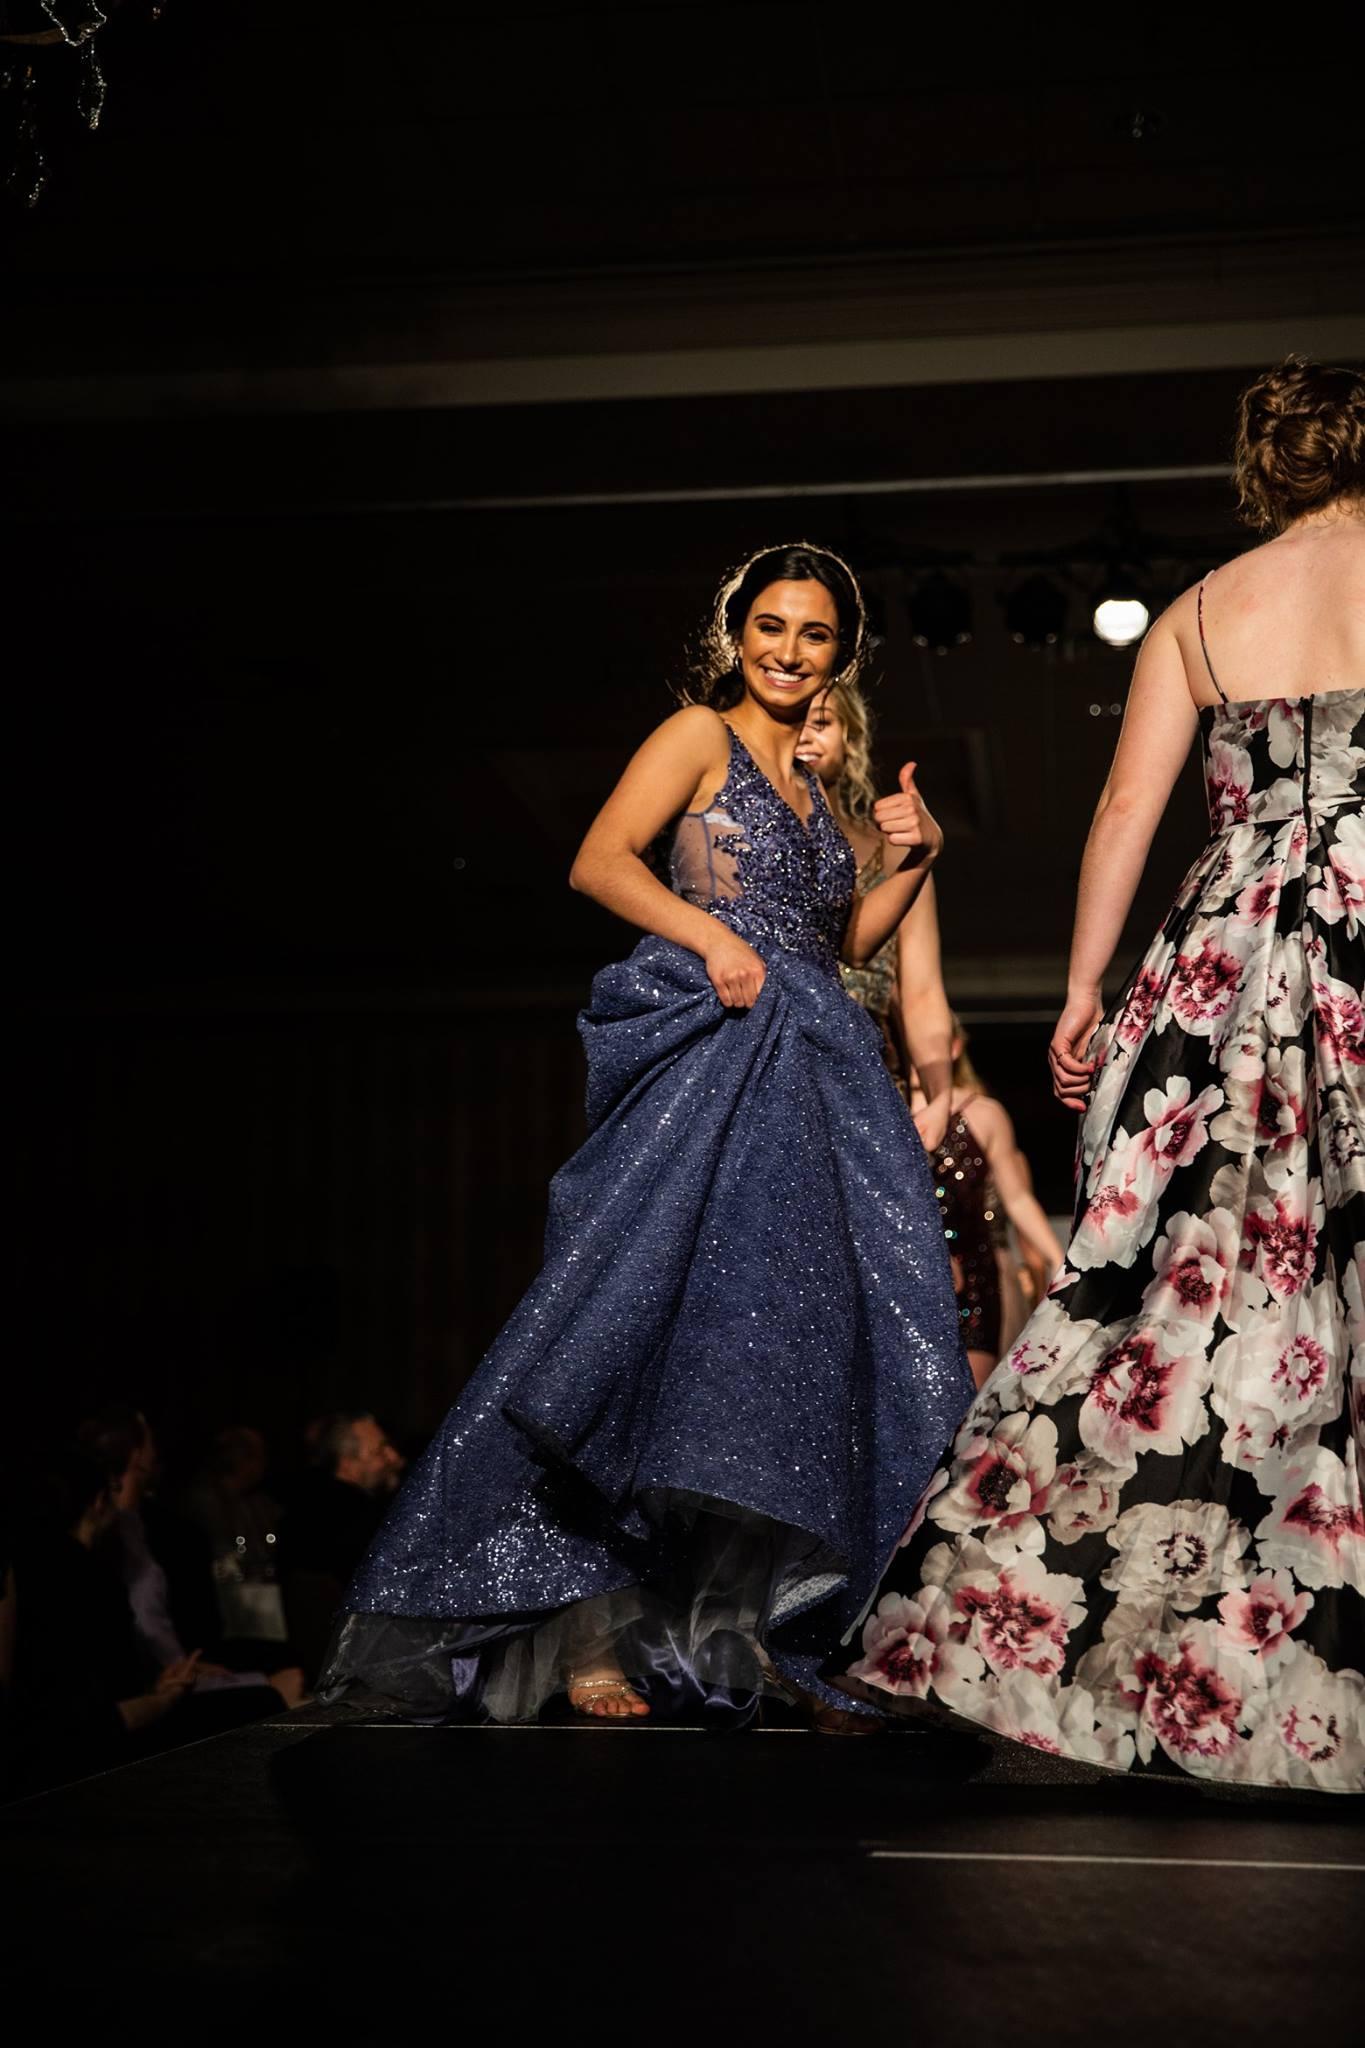 Lutheran_North_High_School_Macomb_Michigan_LHN_Fashion_Show_2019_Seniors (48).jpg